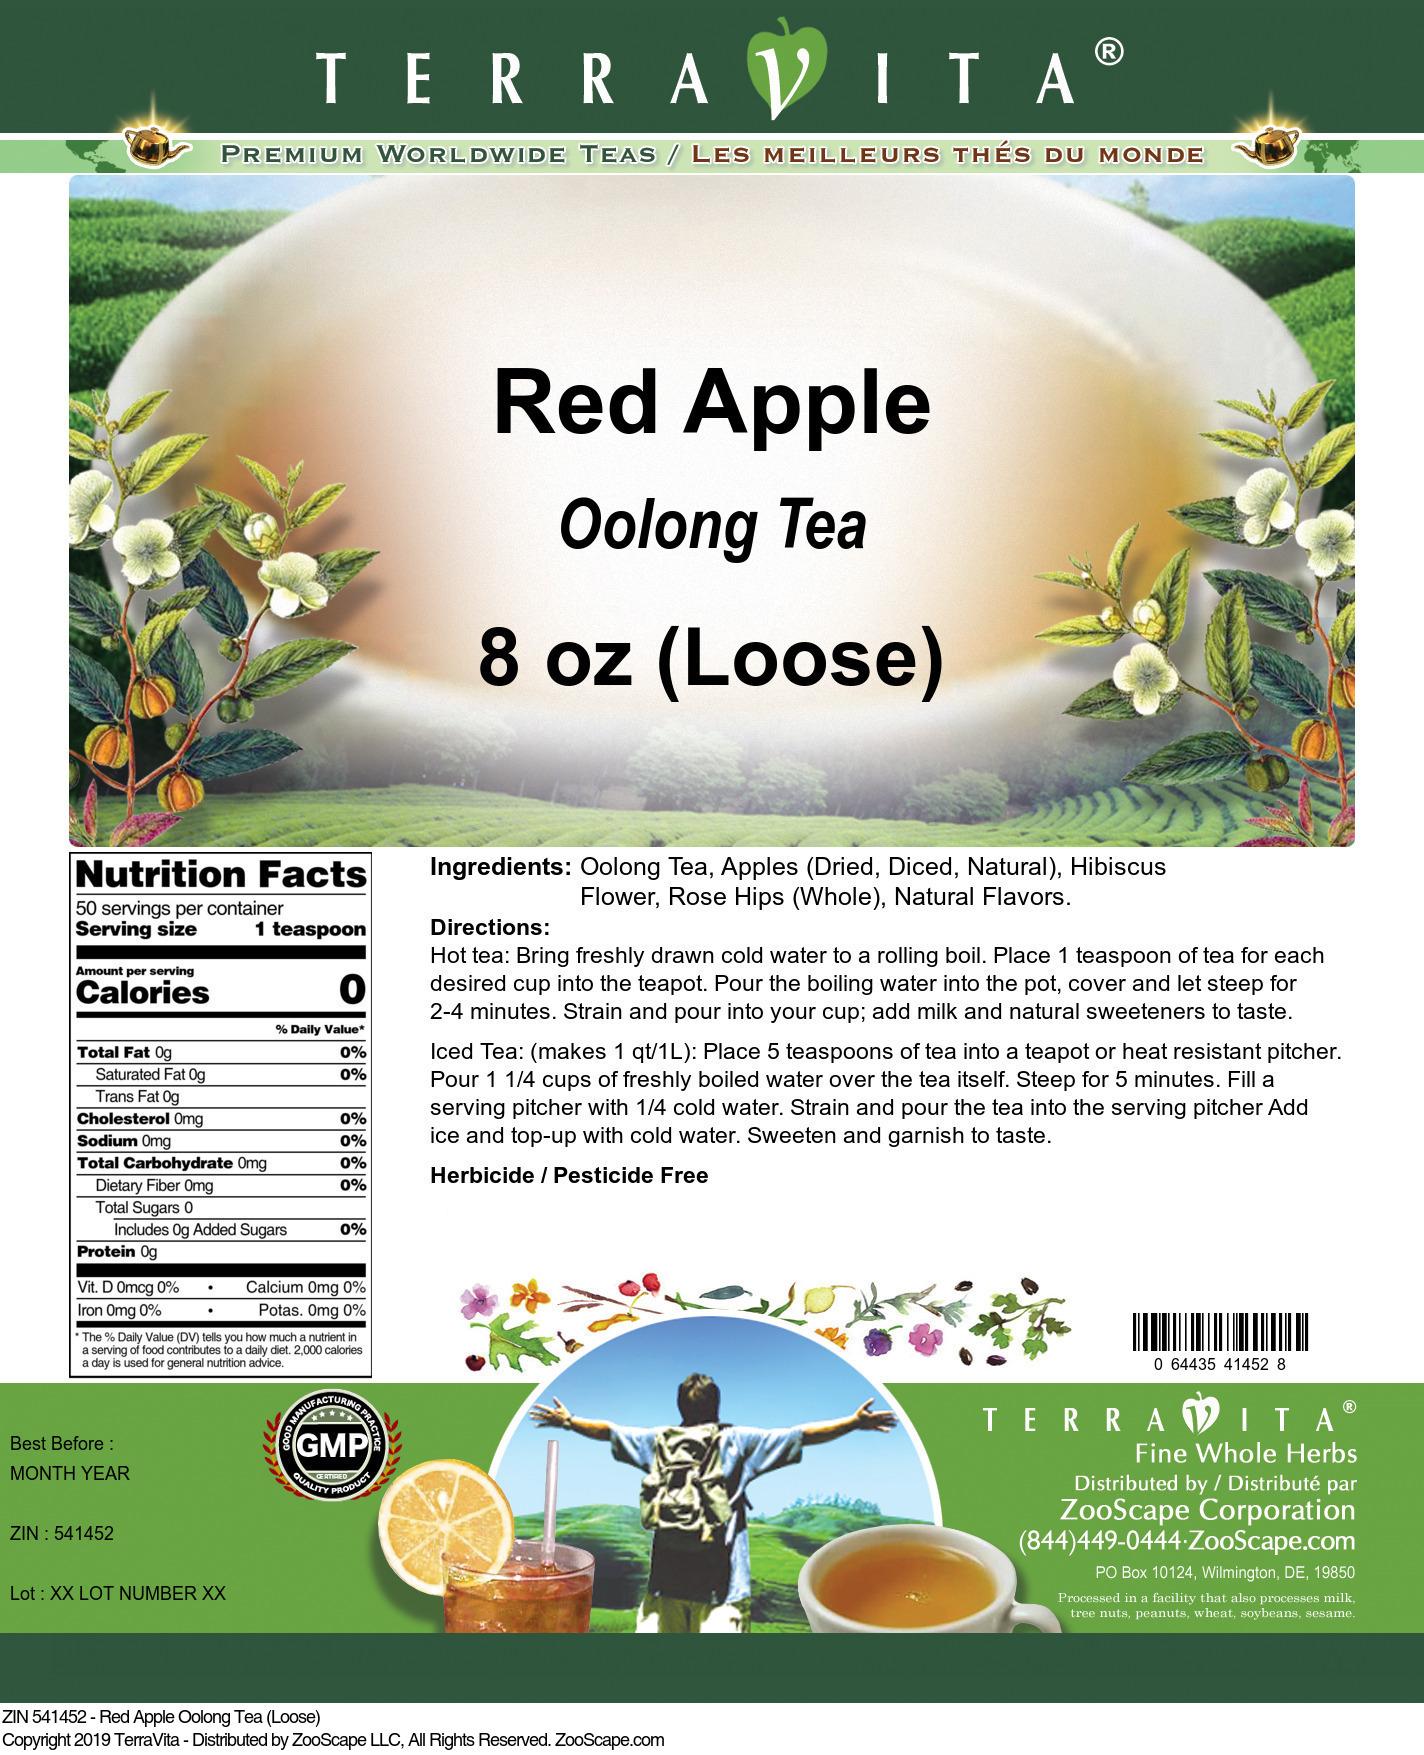 Red Apple Oolong Tea